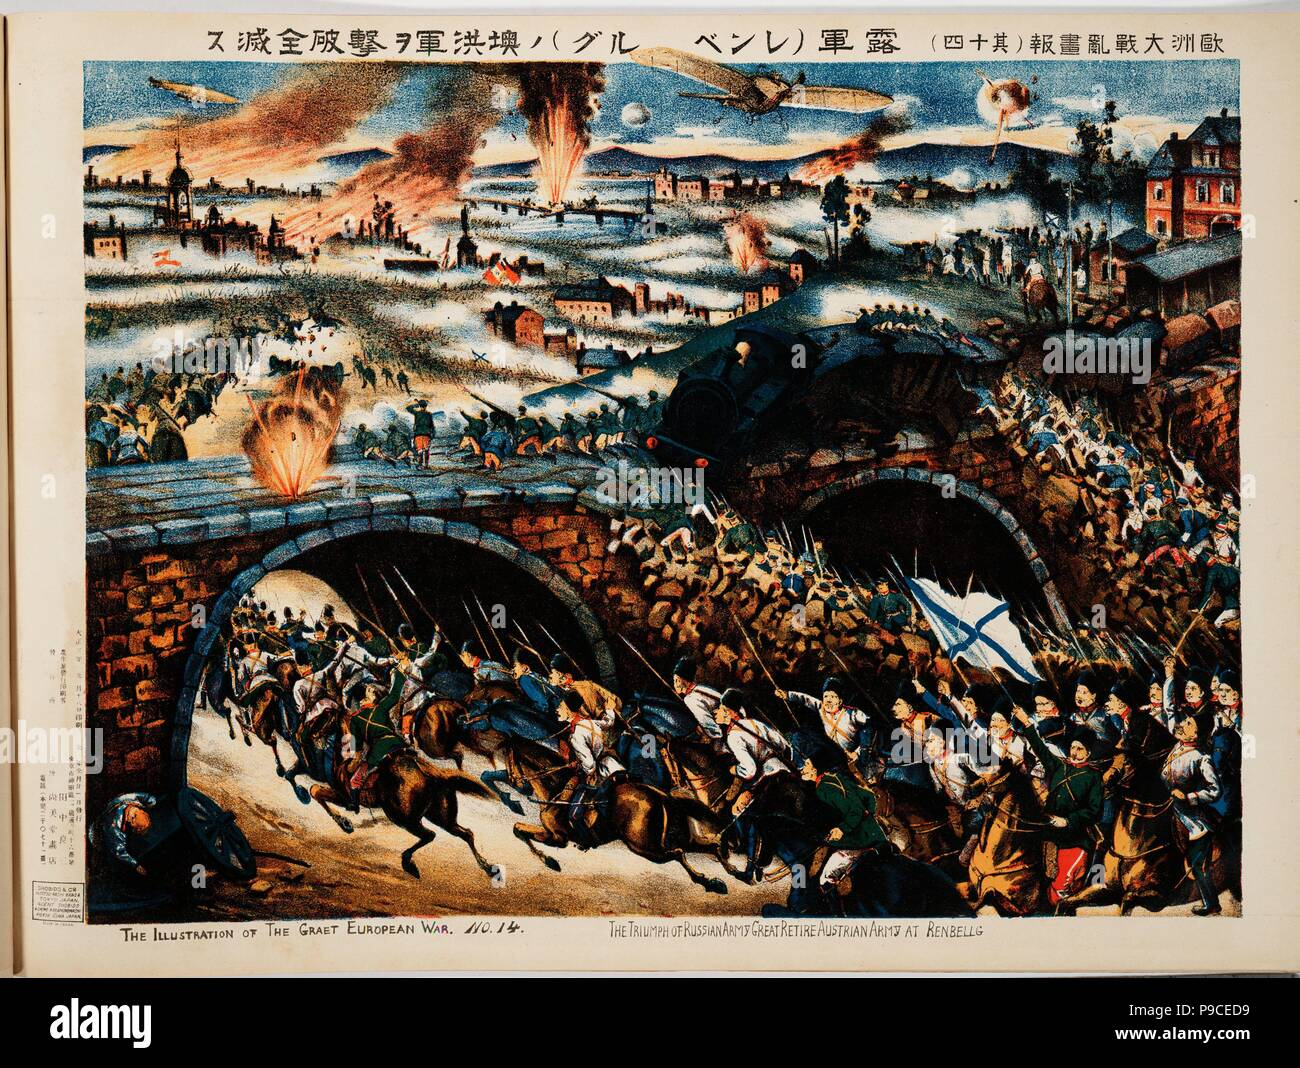 Battle of Galicia: description, history, results 23